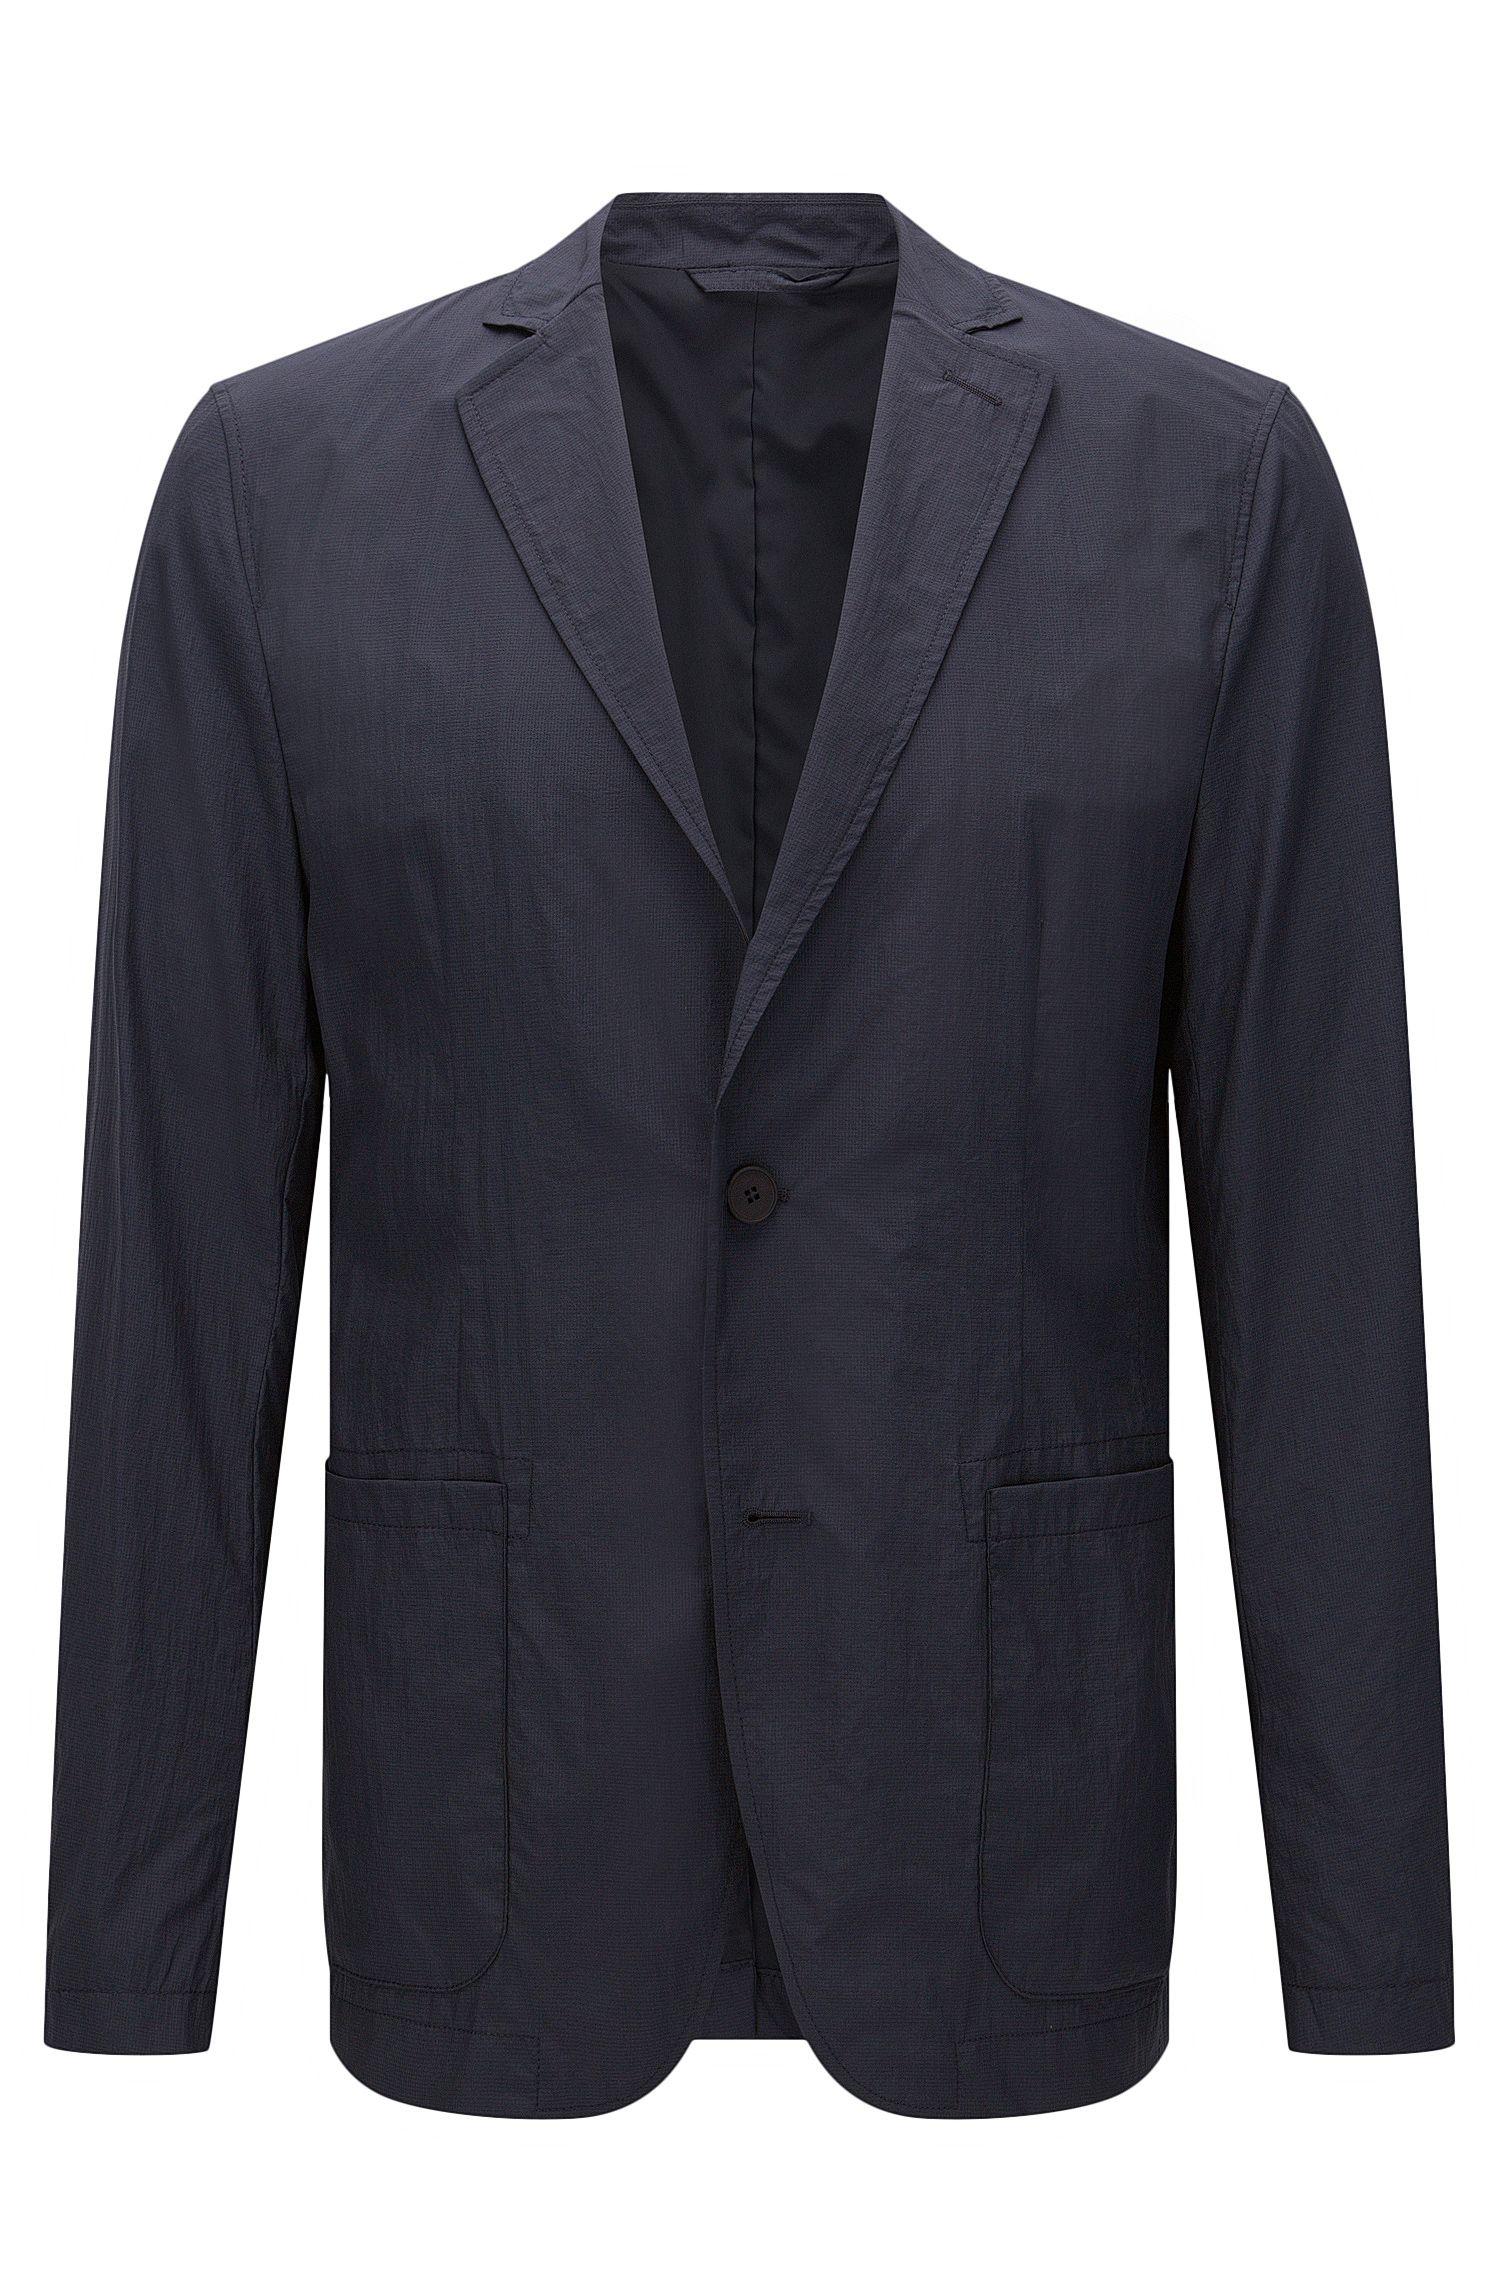 'Noas' | Slim Fit, Nylon Packable Travel Jacket